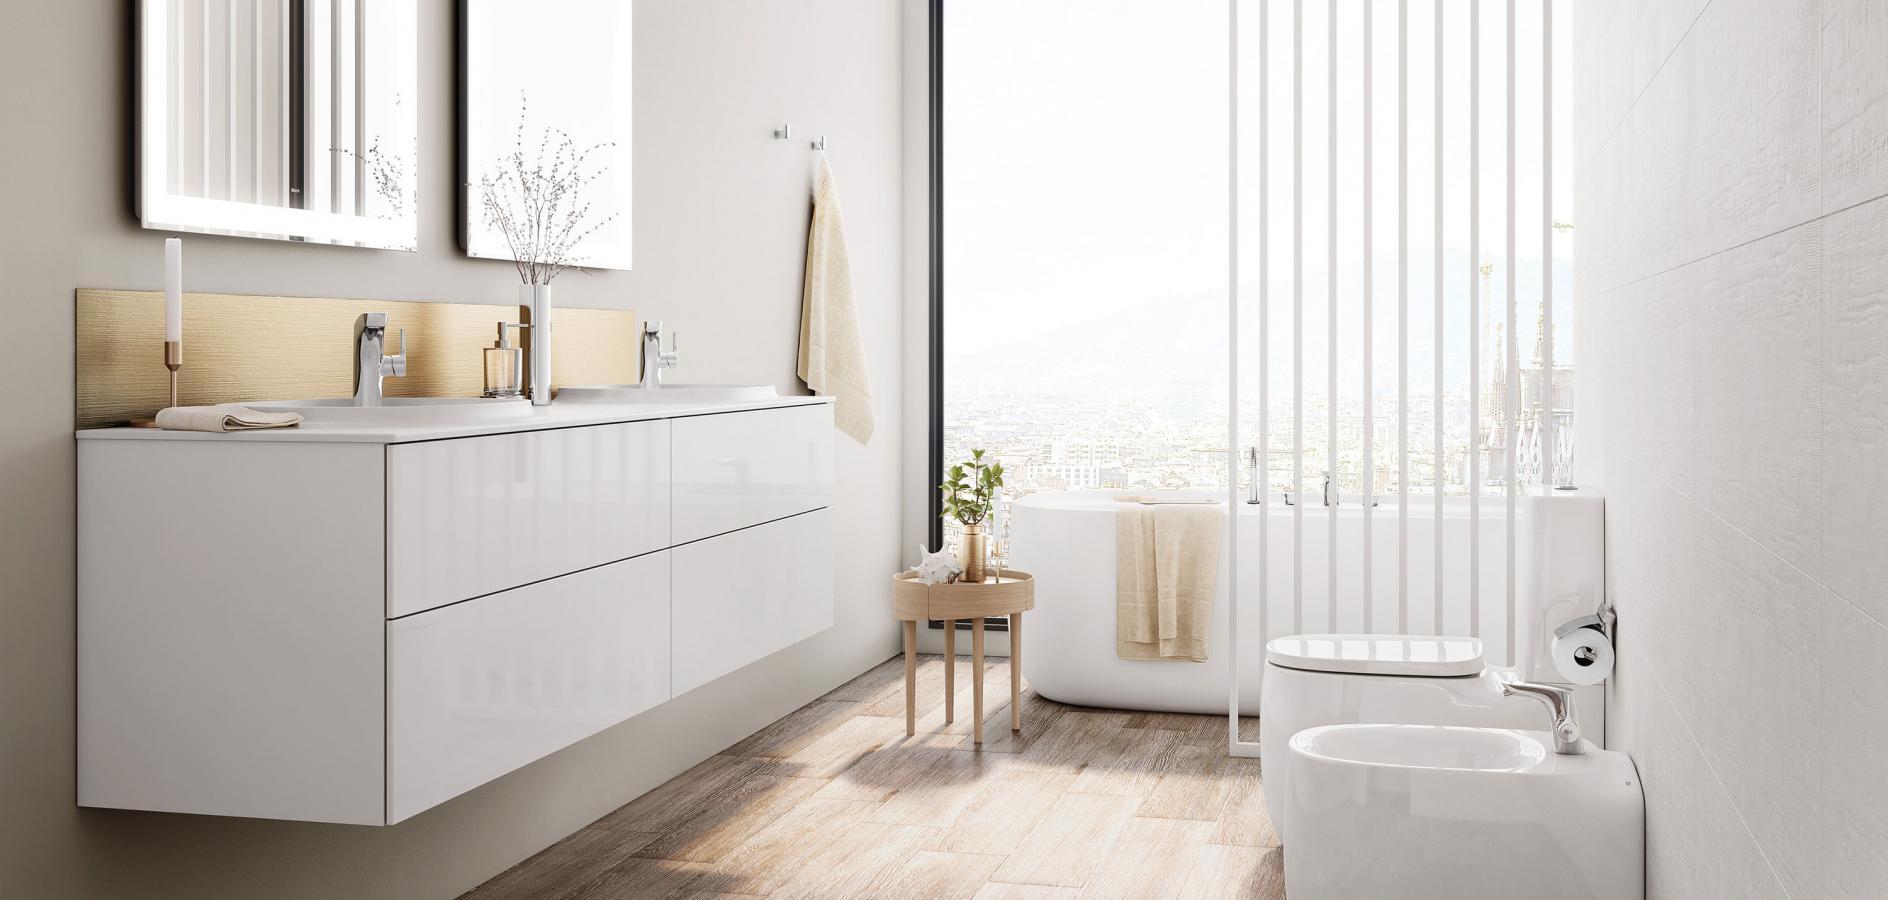 Ensuite Bathroom Ideas Unique Designs Roca Life